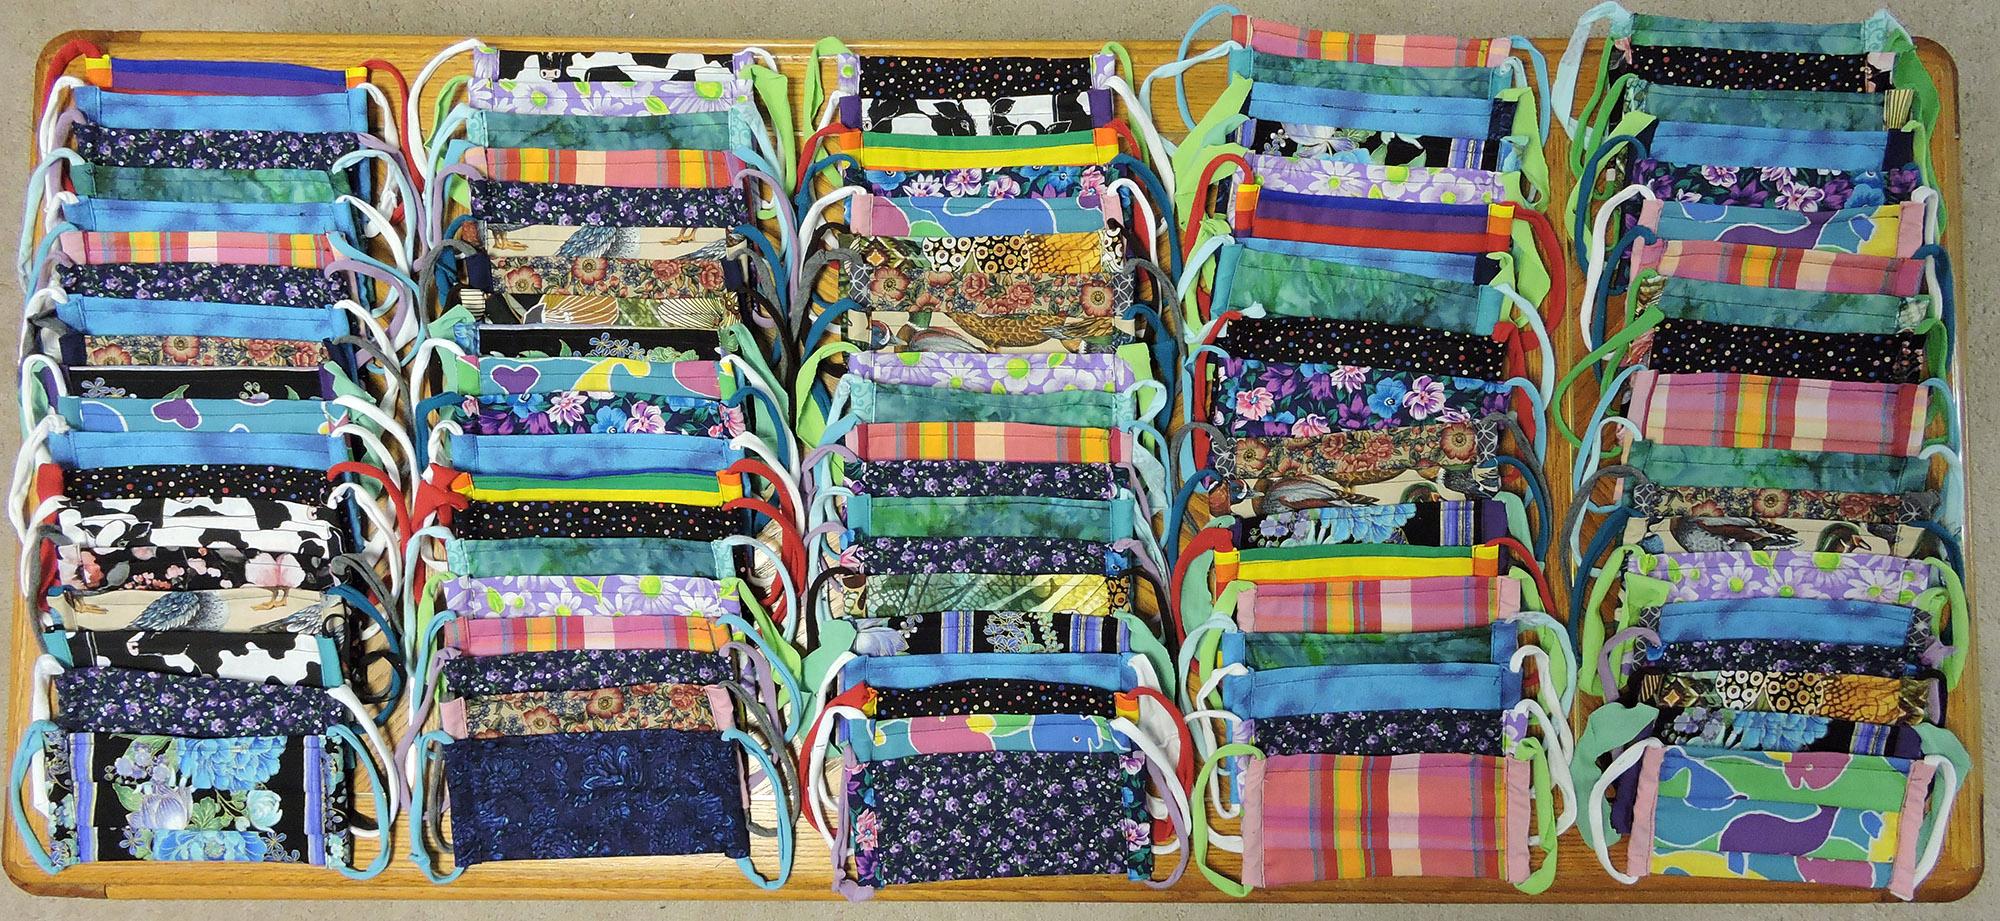 Handmade fabric masks laid out on floor